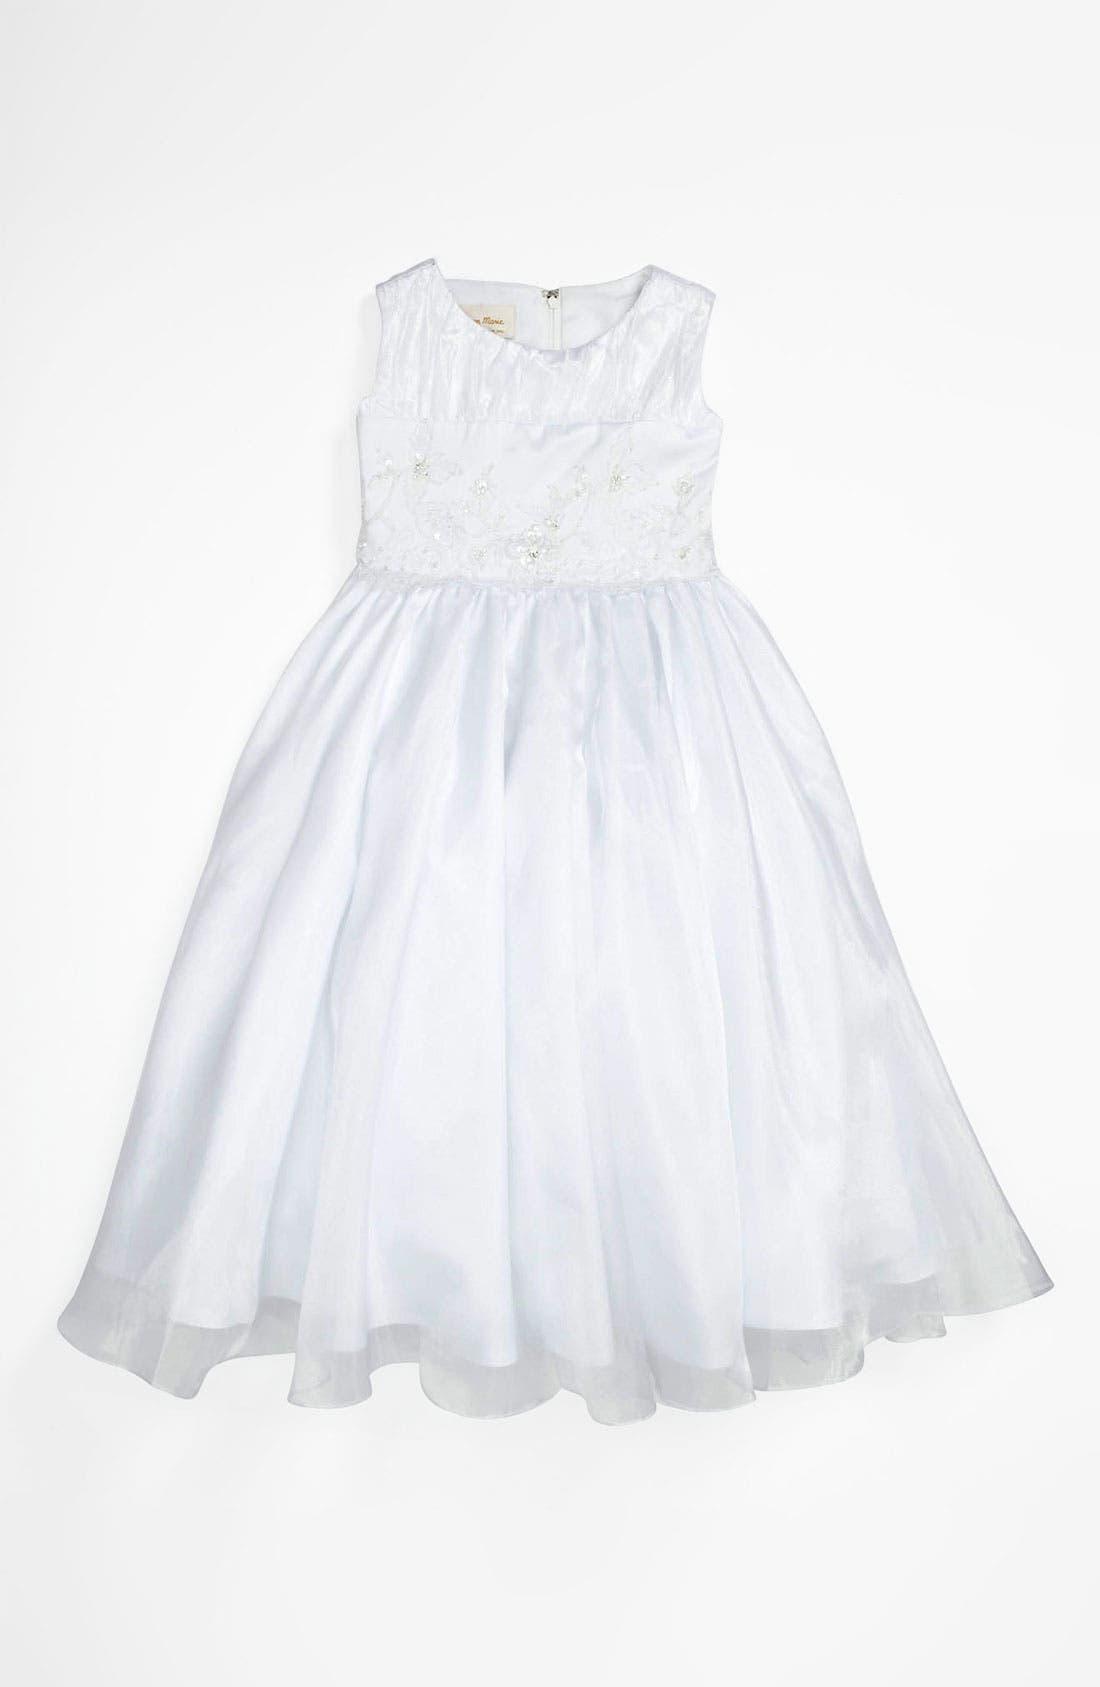 Alternate Image 1 Selected - Lauren Marie Embroidered Dress (Little Girls & Big Girls)